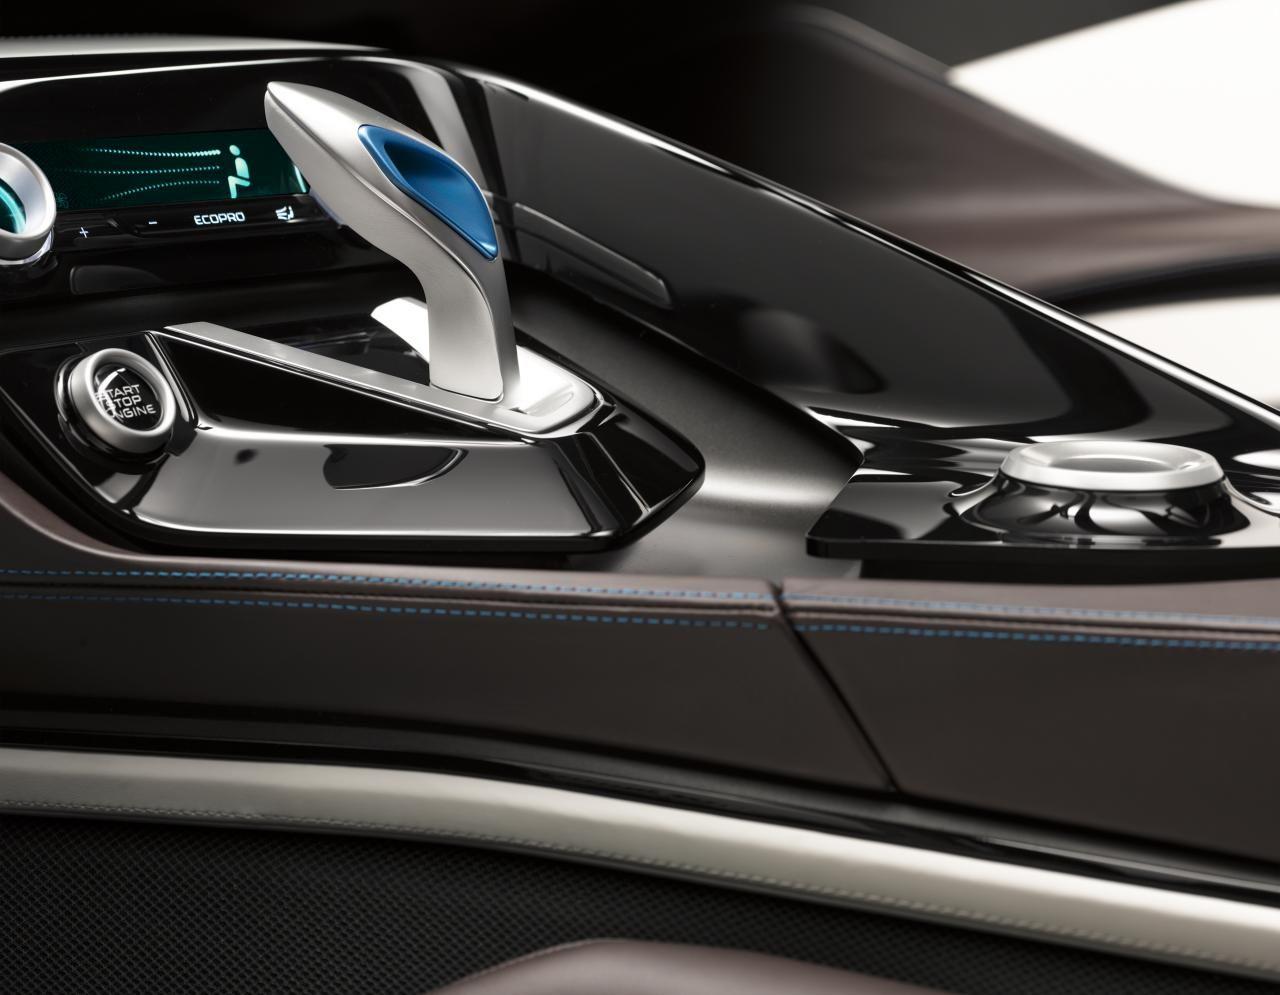 2011 BMW i8 Concept | < Transport > | Pinterest | Bmw i8, BMW and ...